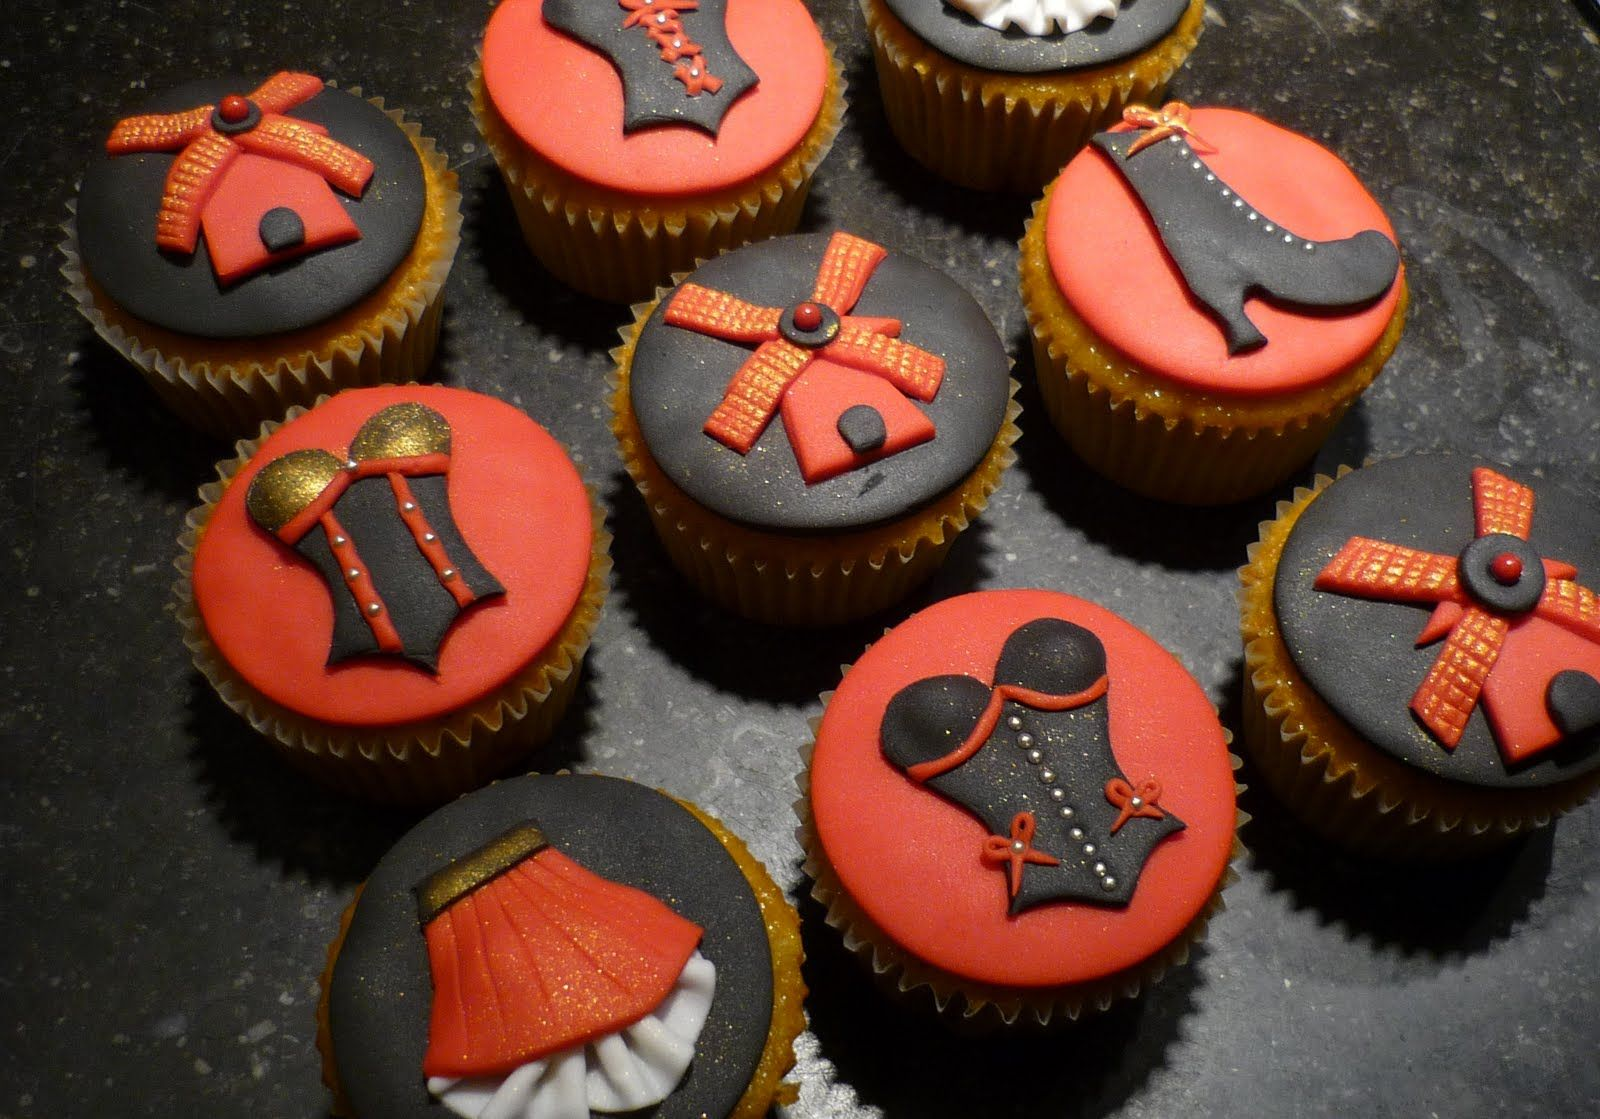 moulin rouge cupcakes | Mini & cupcake decor | Moulin ...